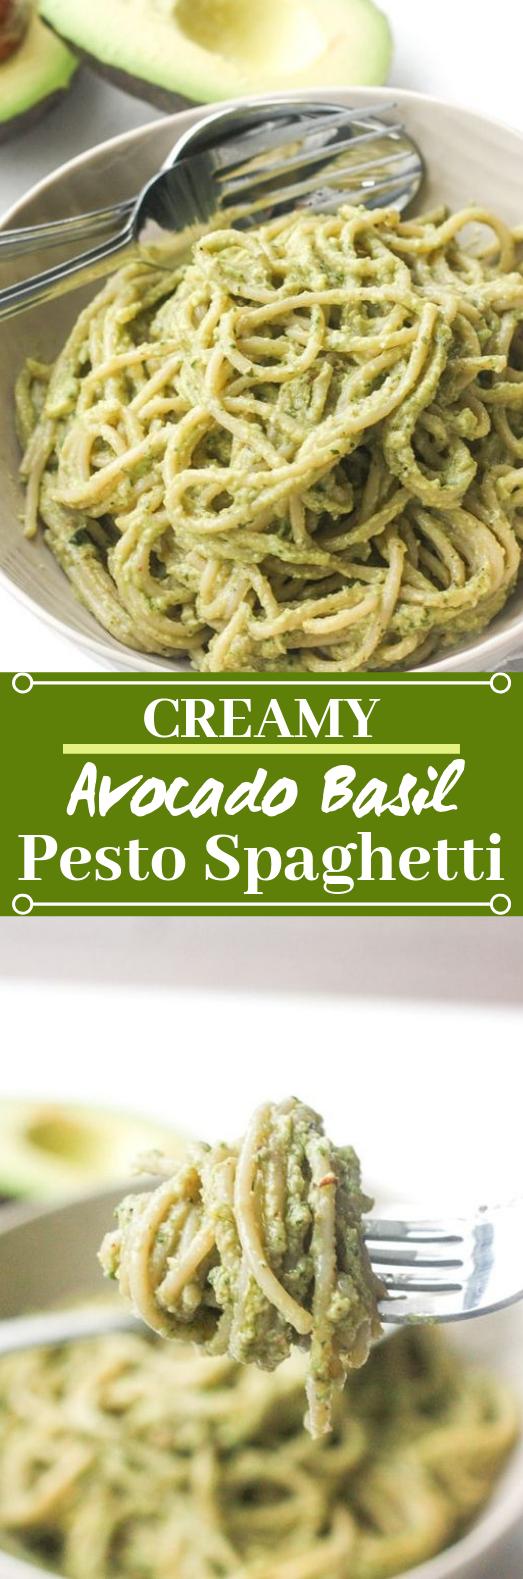 Creamy Avocado Basil Pesto Spaghetti #vegetarian #pasta